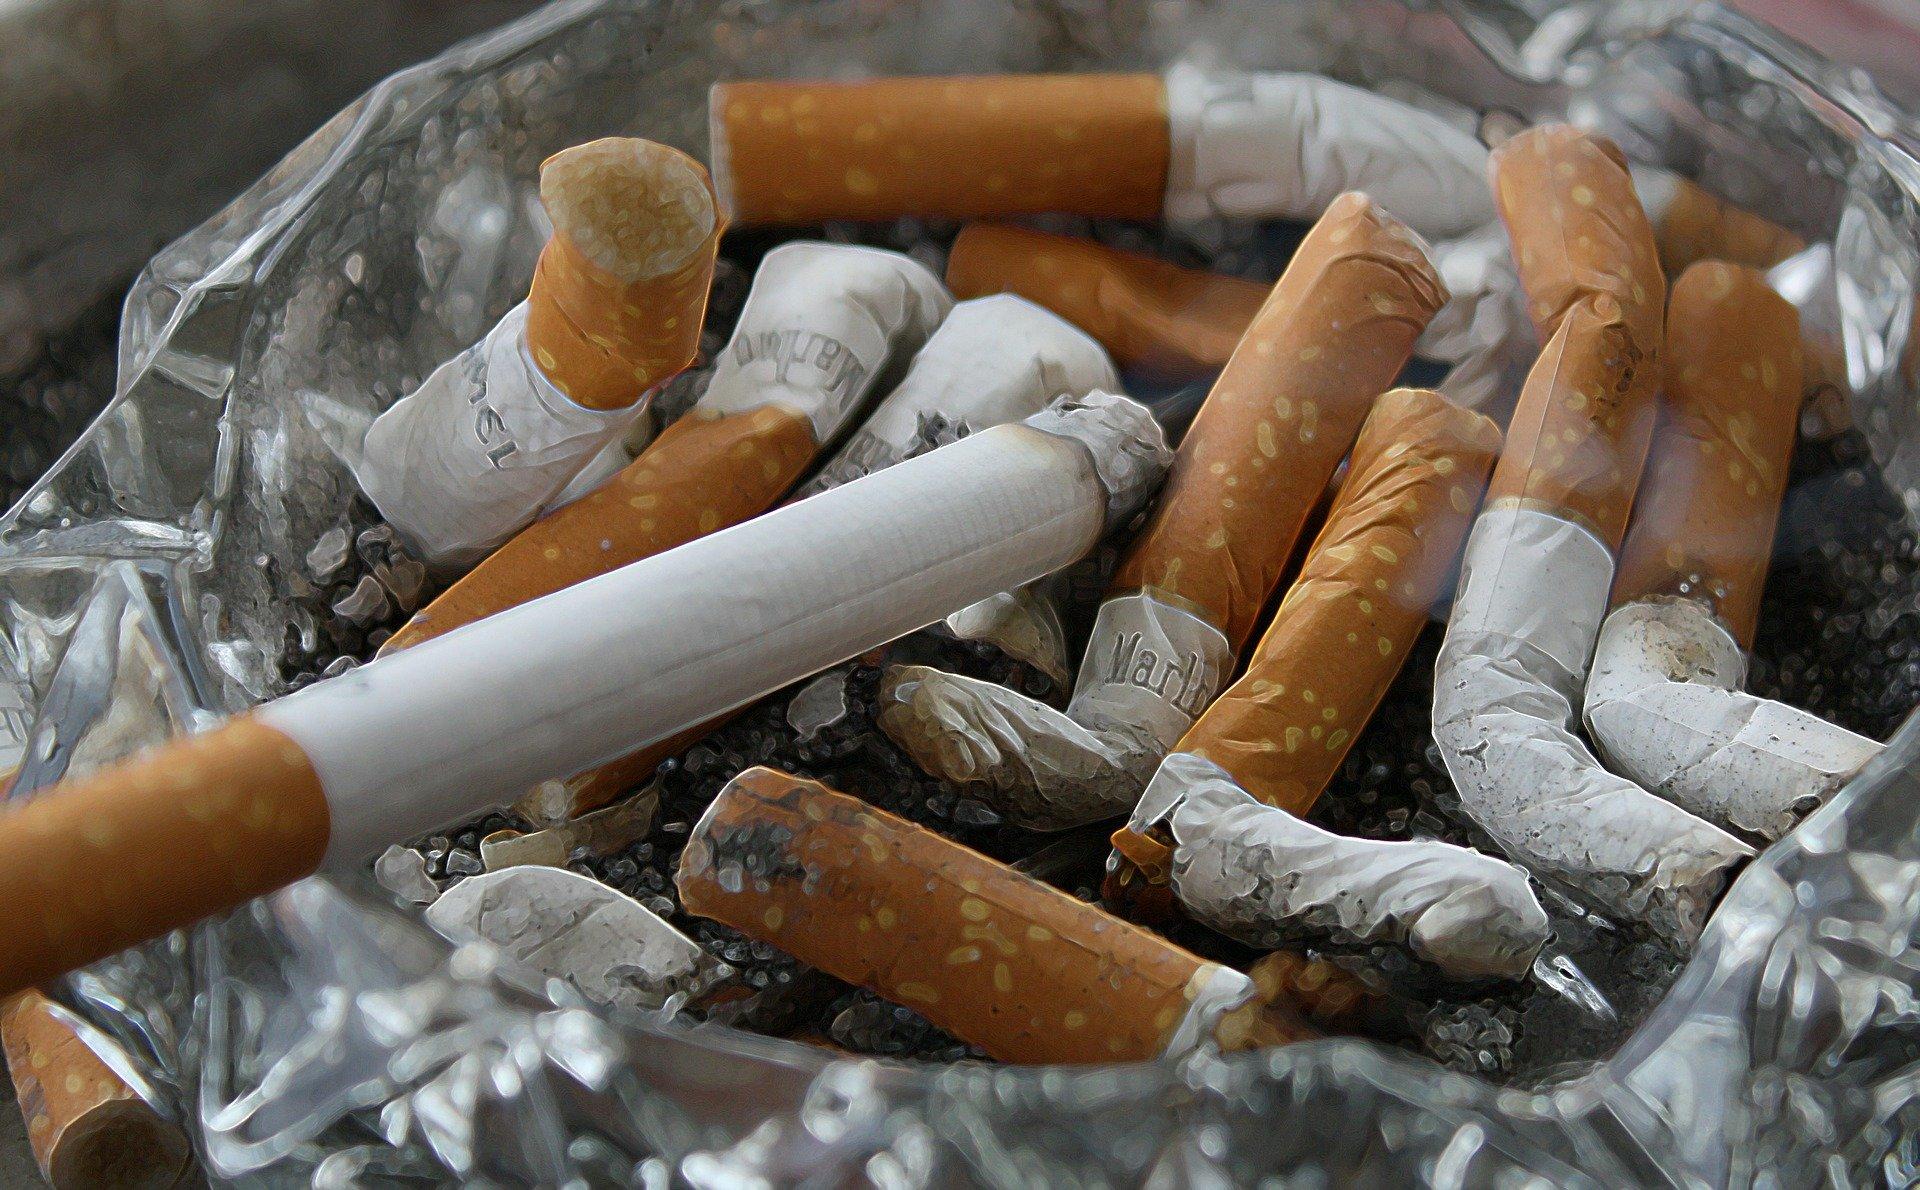 Lower Myostatin Levels. cigarette. smoke. smoking. ashtray. www.blisslife.in